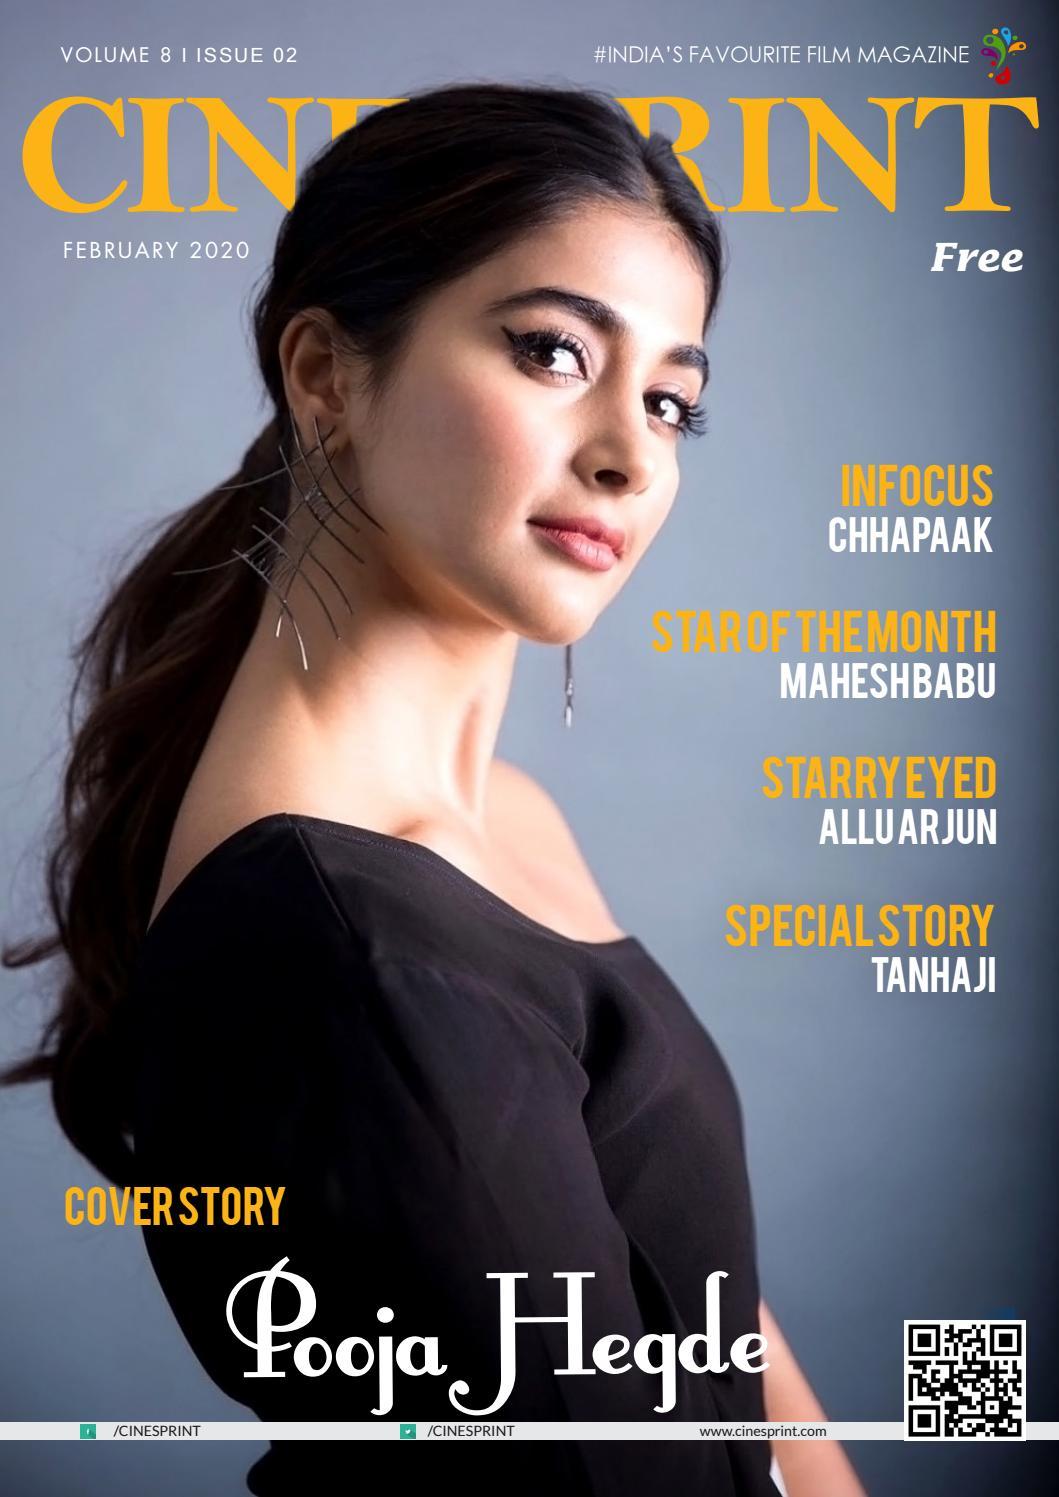 Cinesprint Magazine February 2020 By Wishesh Digital Media Pvt Ltd Issuu